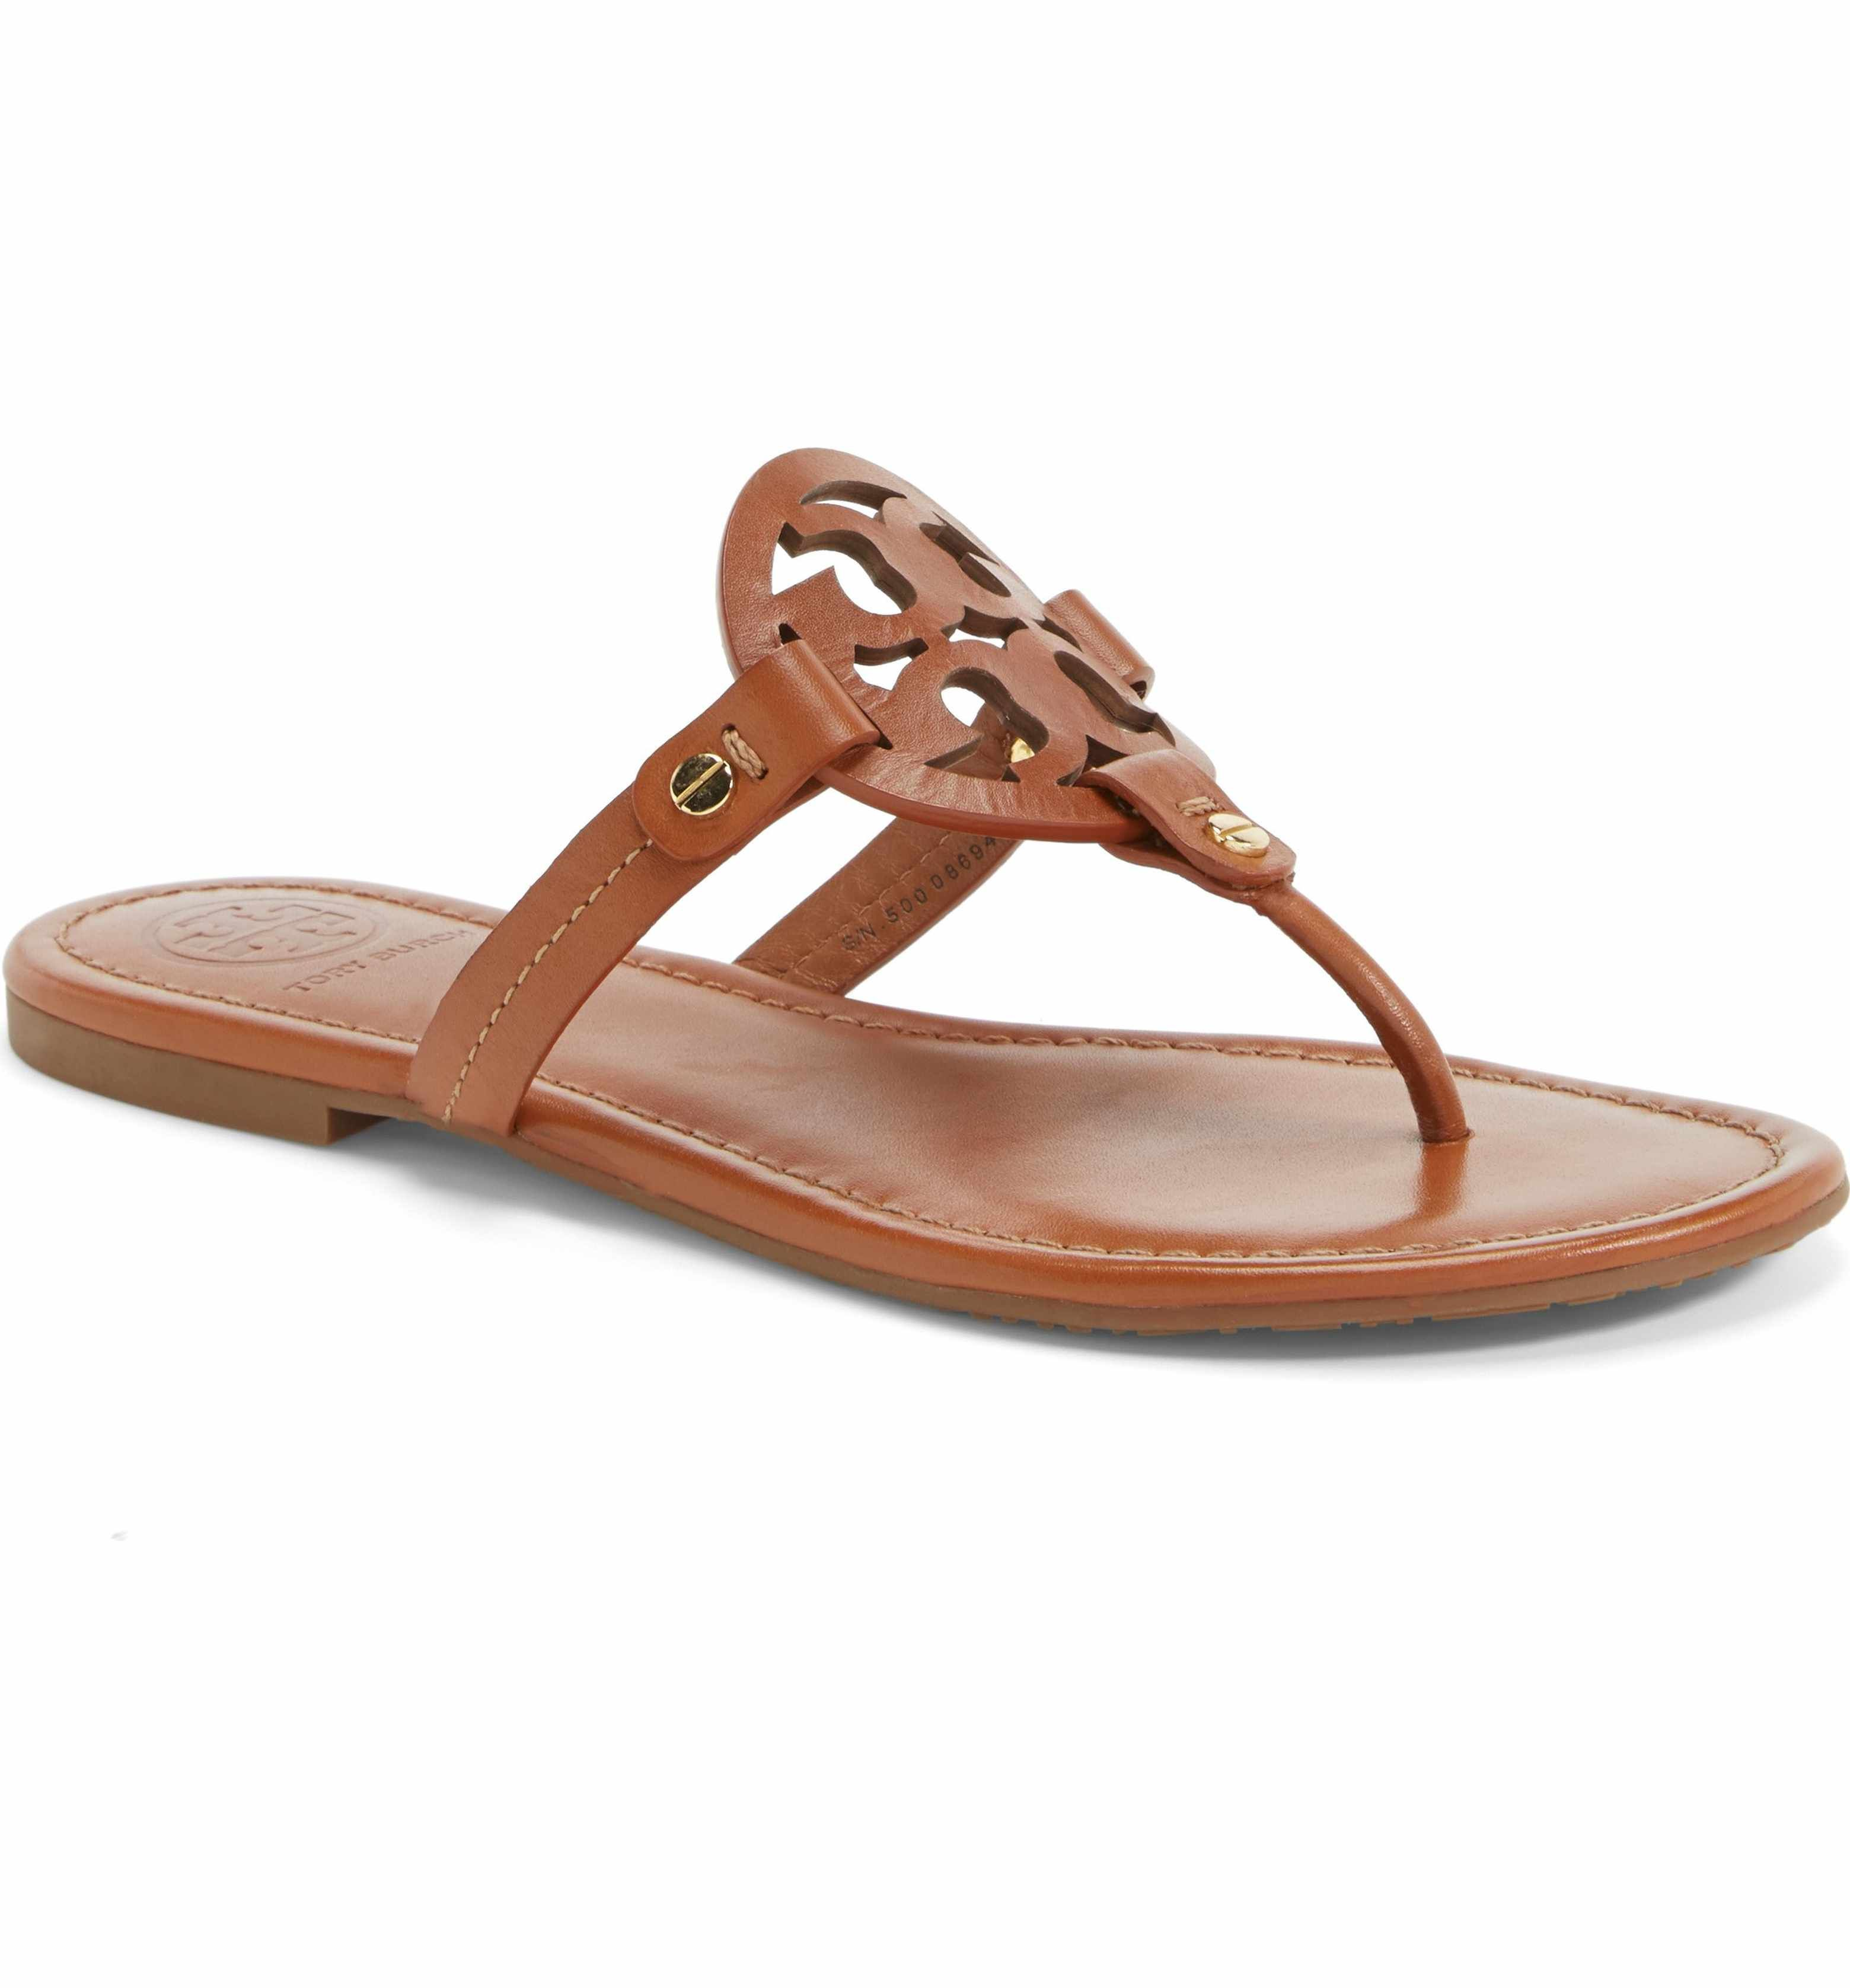 d9f61df67b40  Miller  Flip Flop. Miller SandalTory Burch Flip FlopsTory Burch Sandals Women SandalsNordstromIvory ...